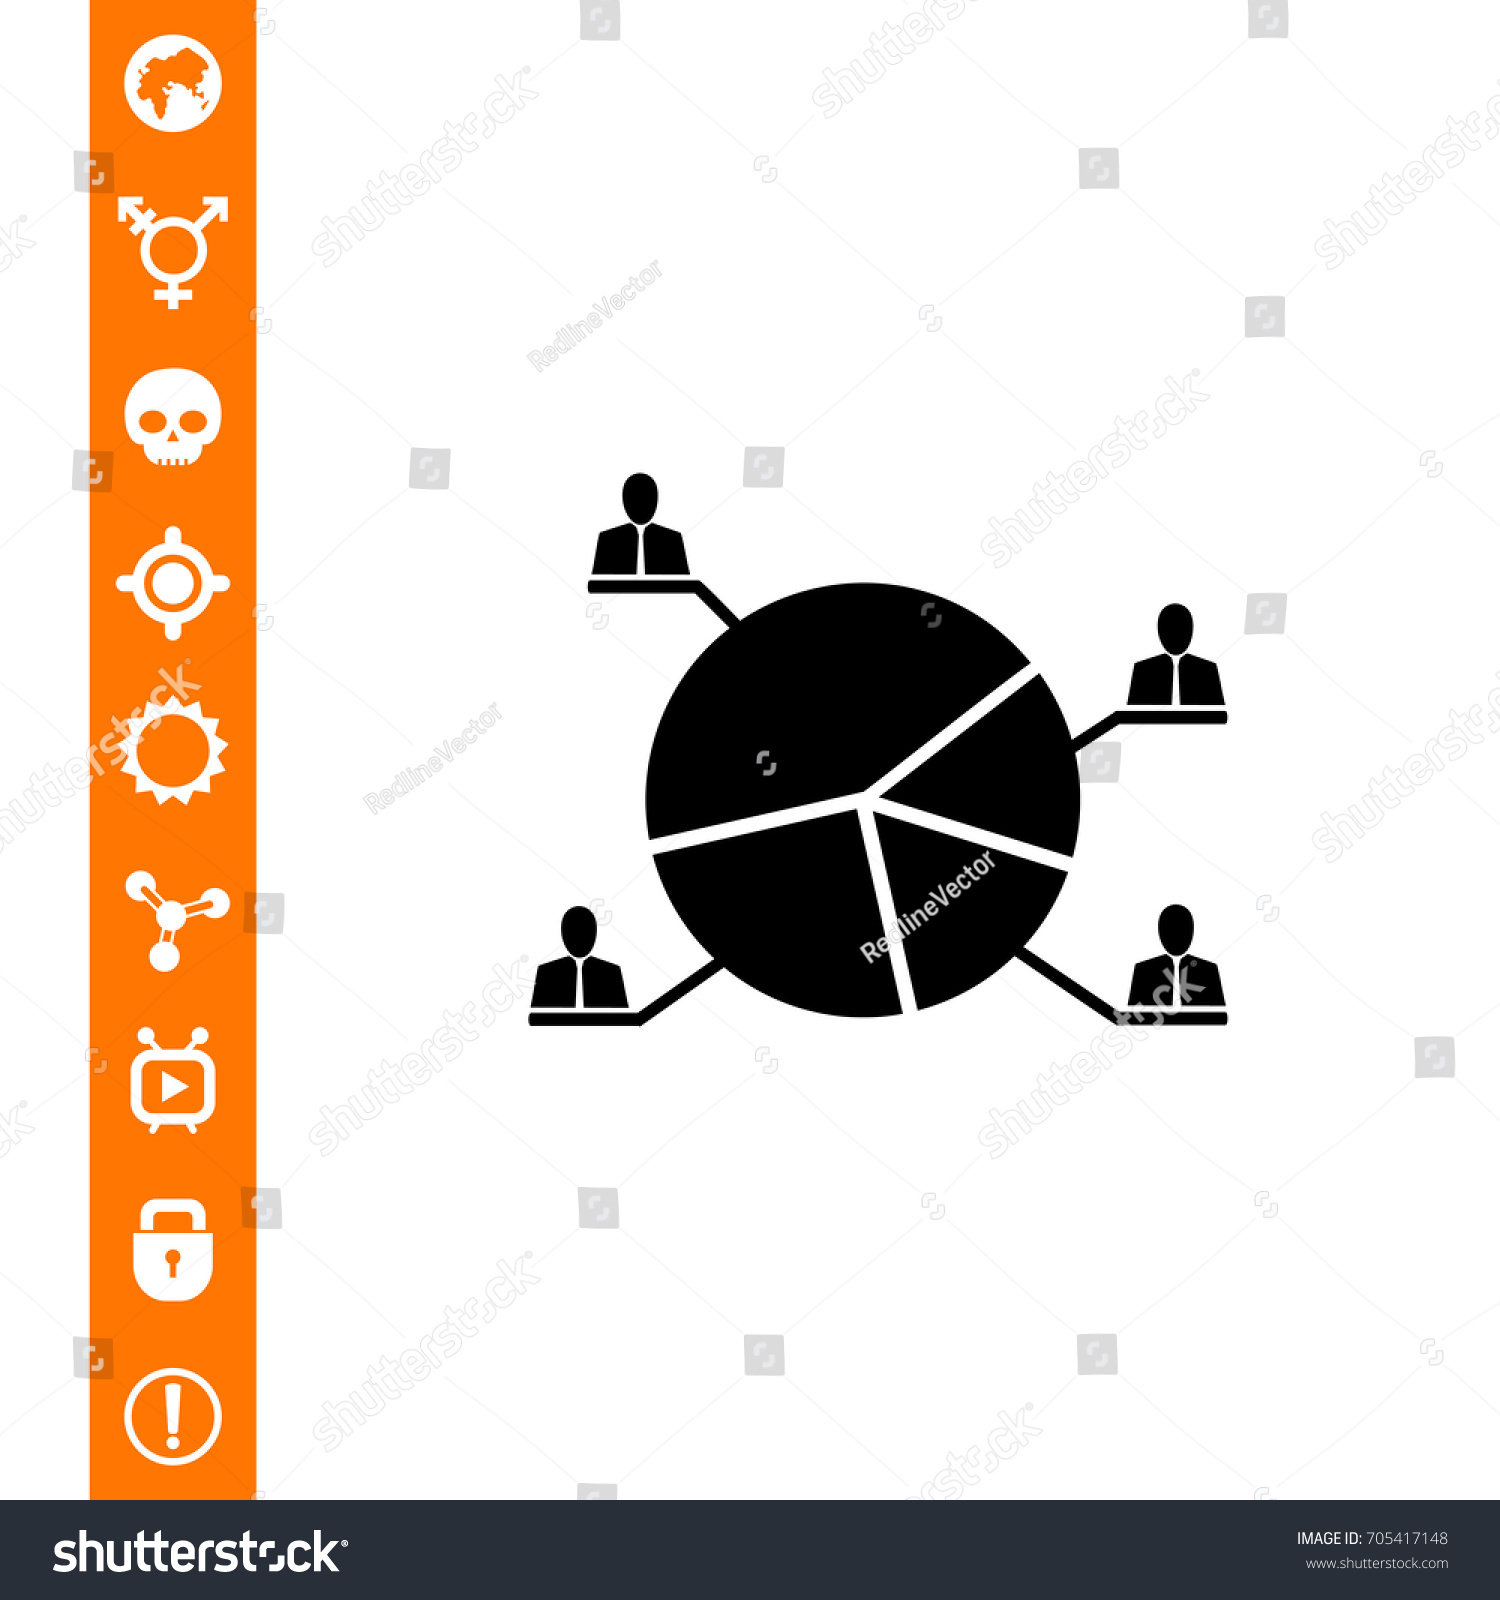 Election apple pie chart icon stock vector 705417148 shutterstock election apple pie chart icon nvjuhfo Images